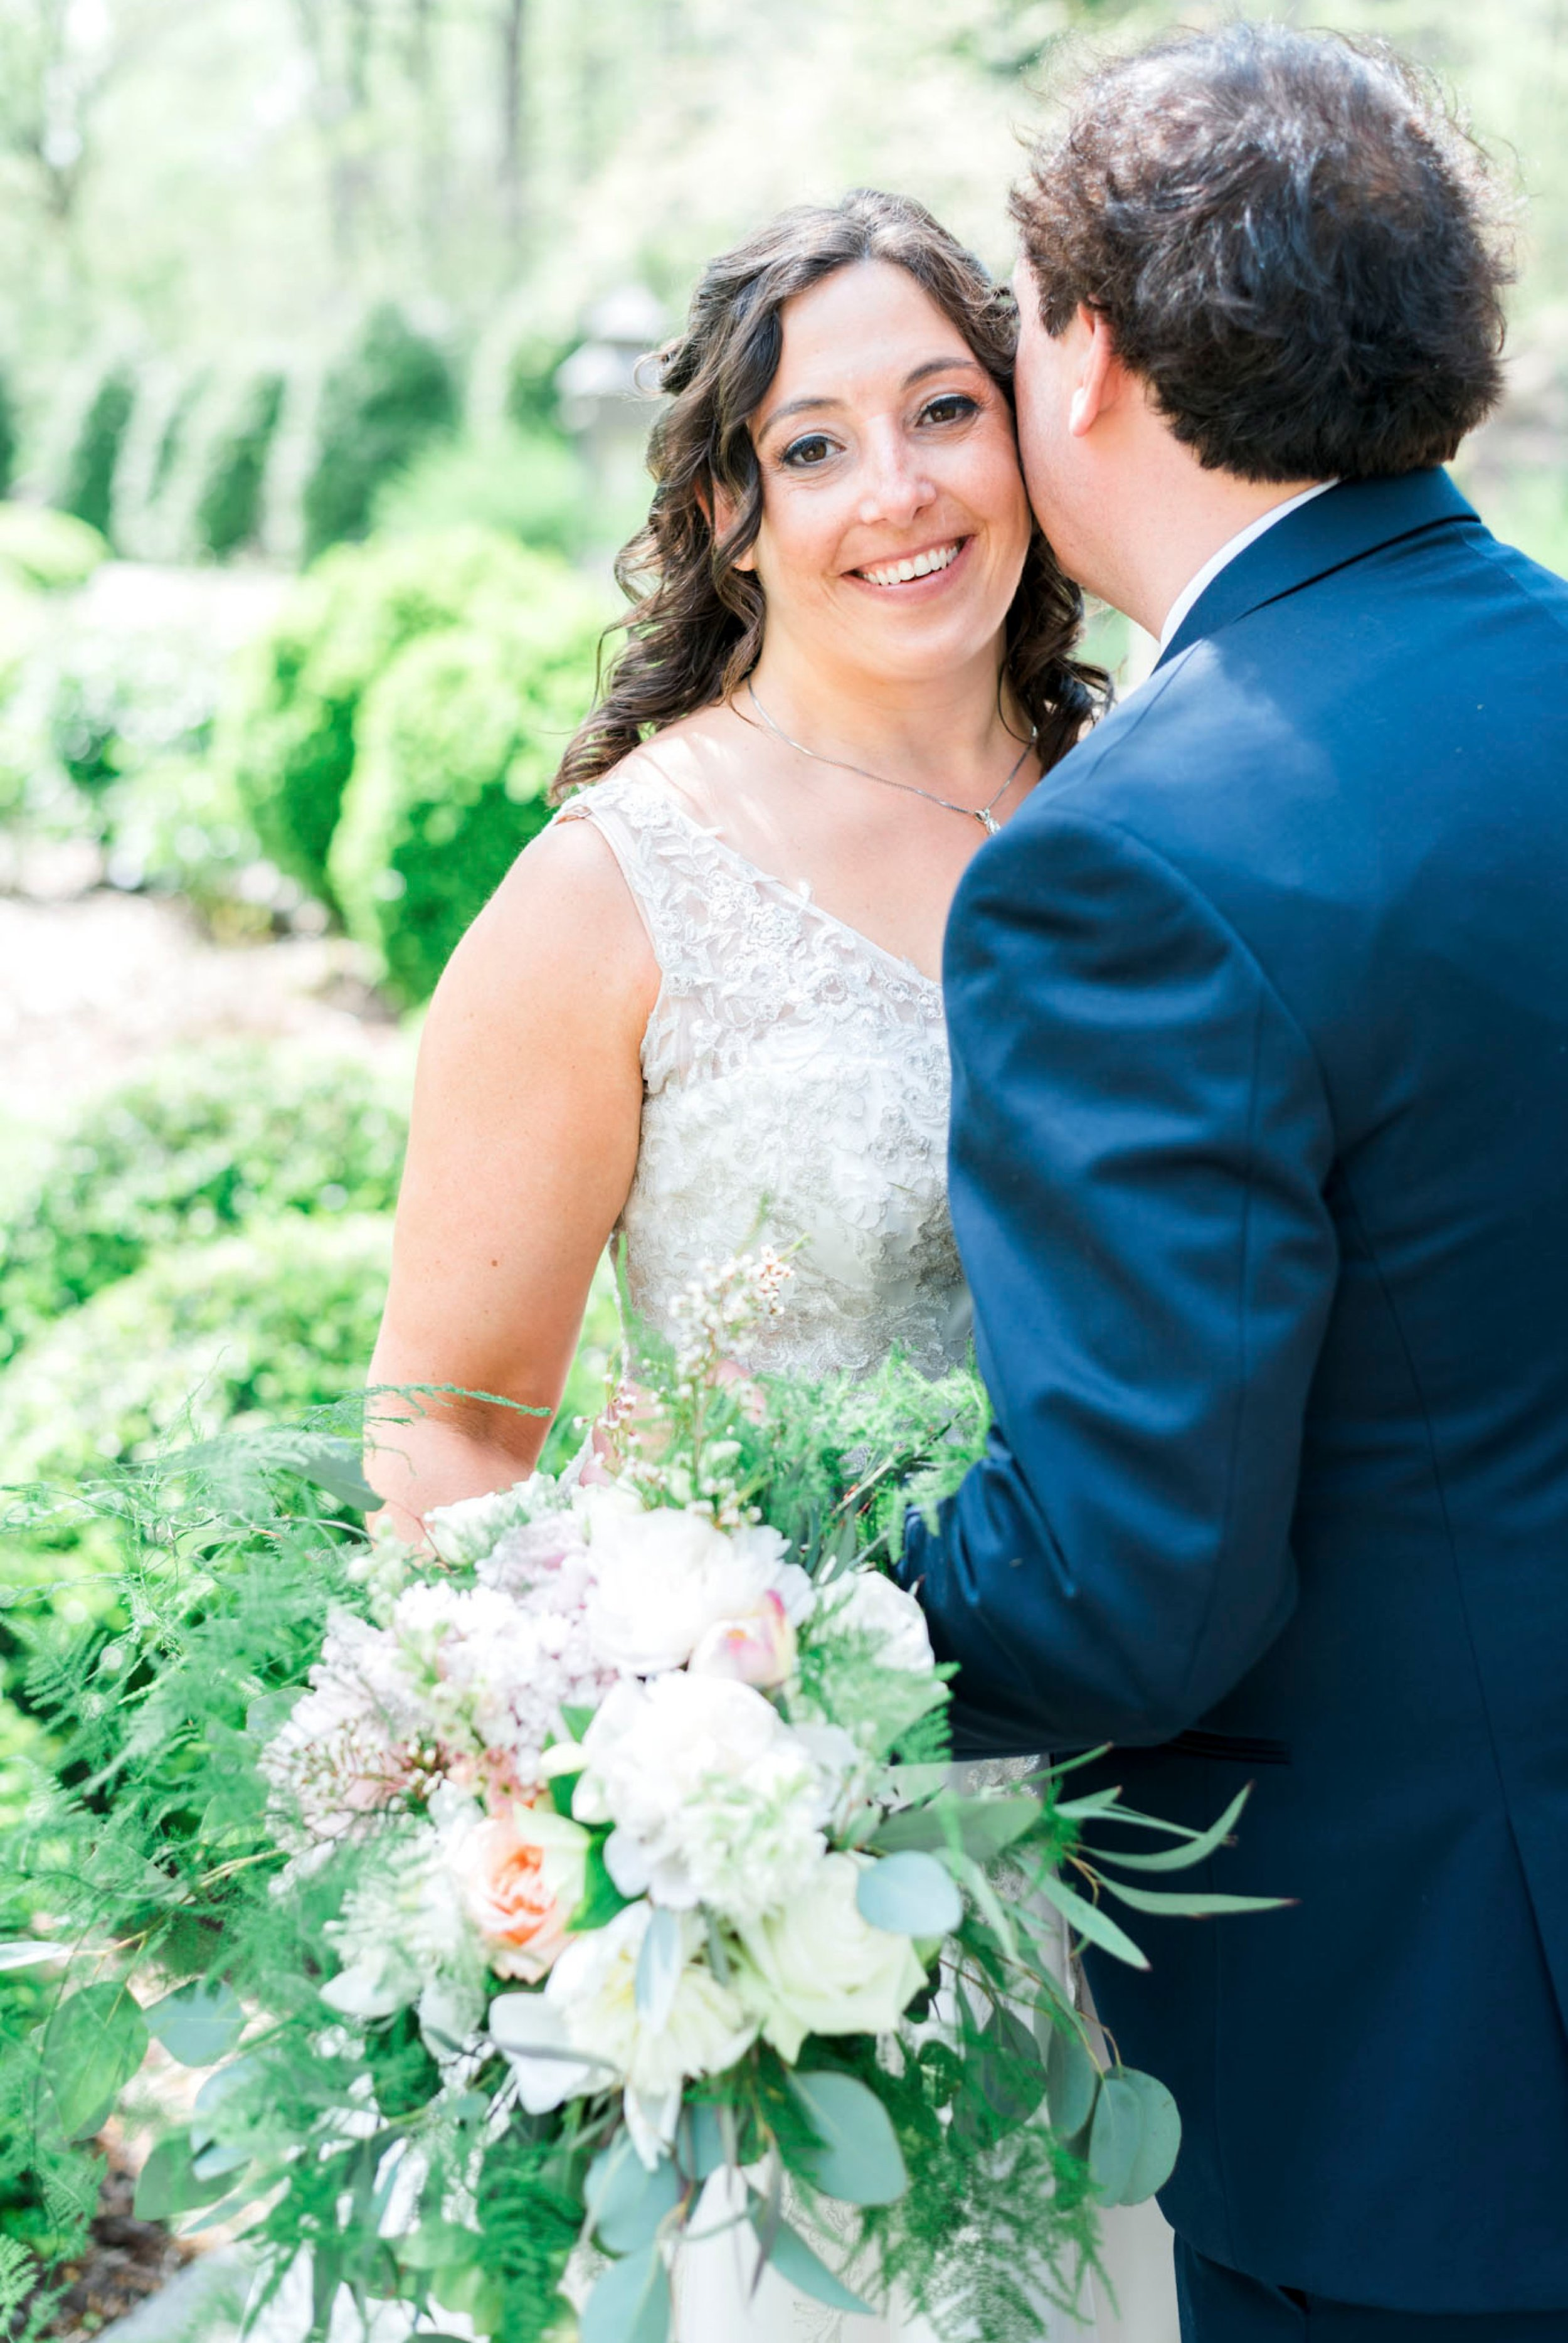 TheVirginianHotel_LynchburgVA_TheVirginianHotelWedding_Virginiaweddingphotographer_Lynchburgvawedding 25.jpg